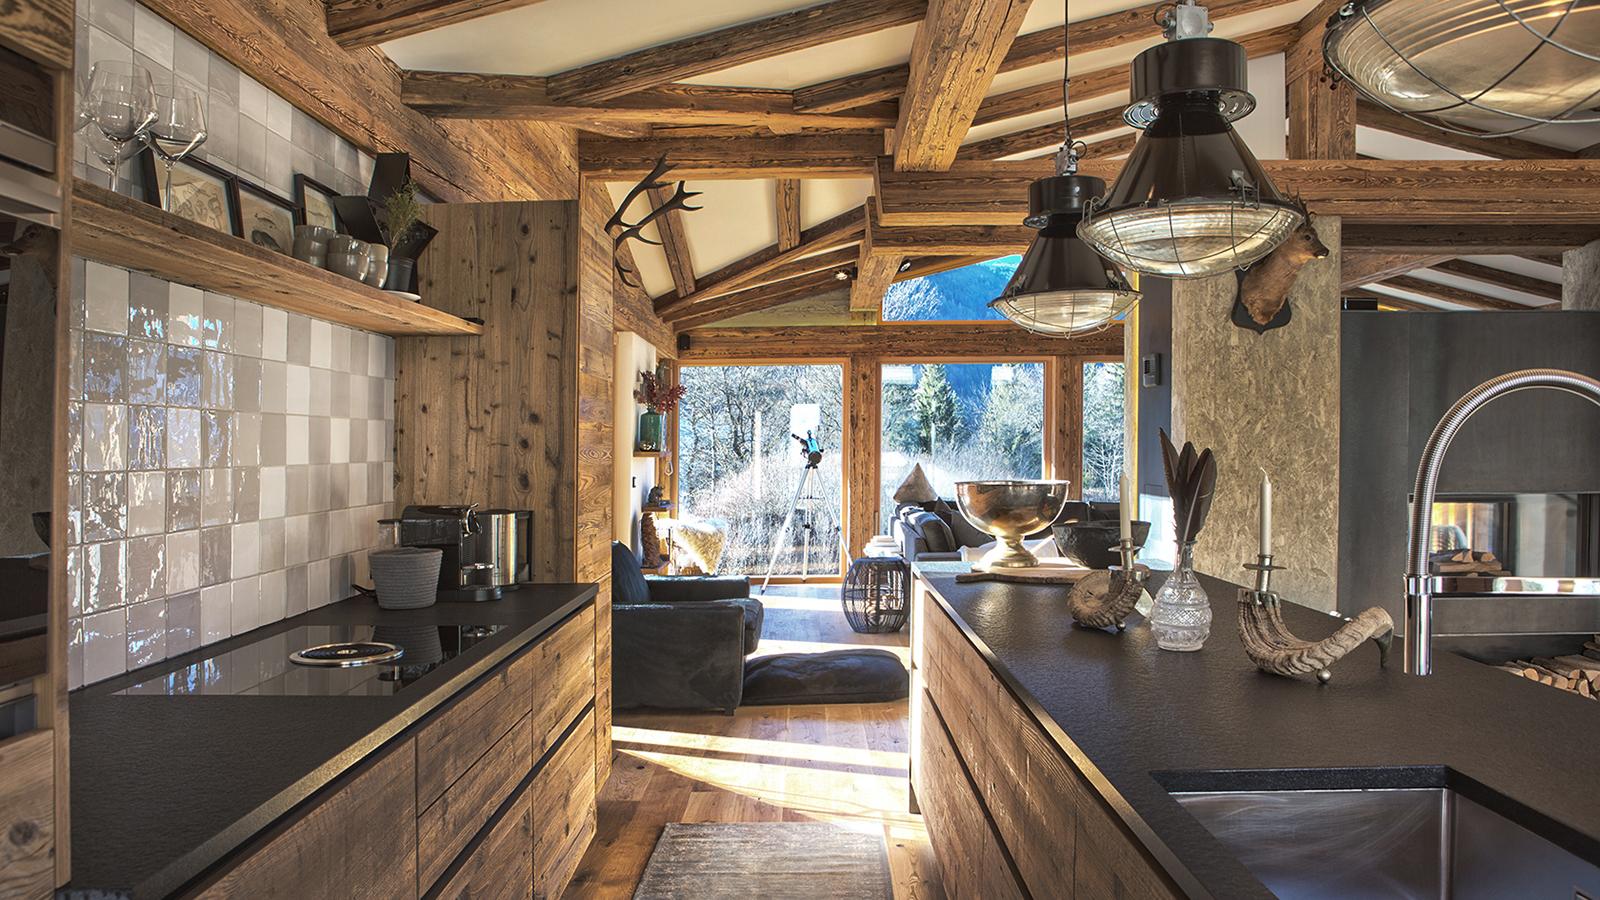 Chalet Luxe Chalet, Austria